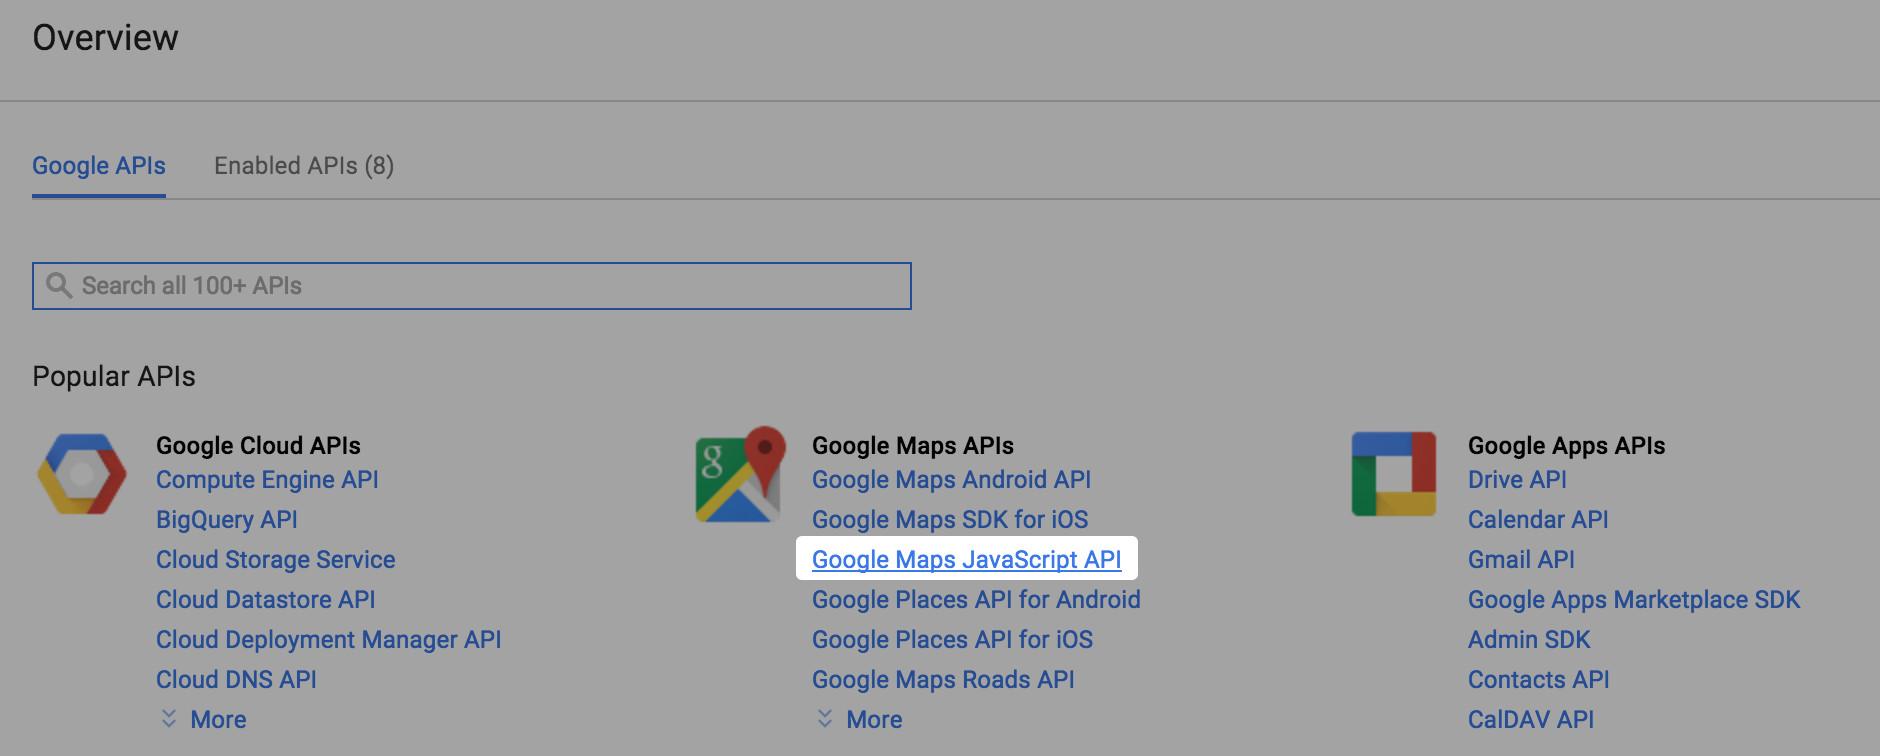 Click on Google Maps Javascript API